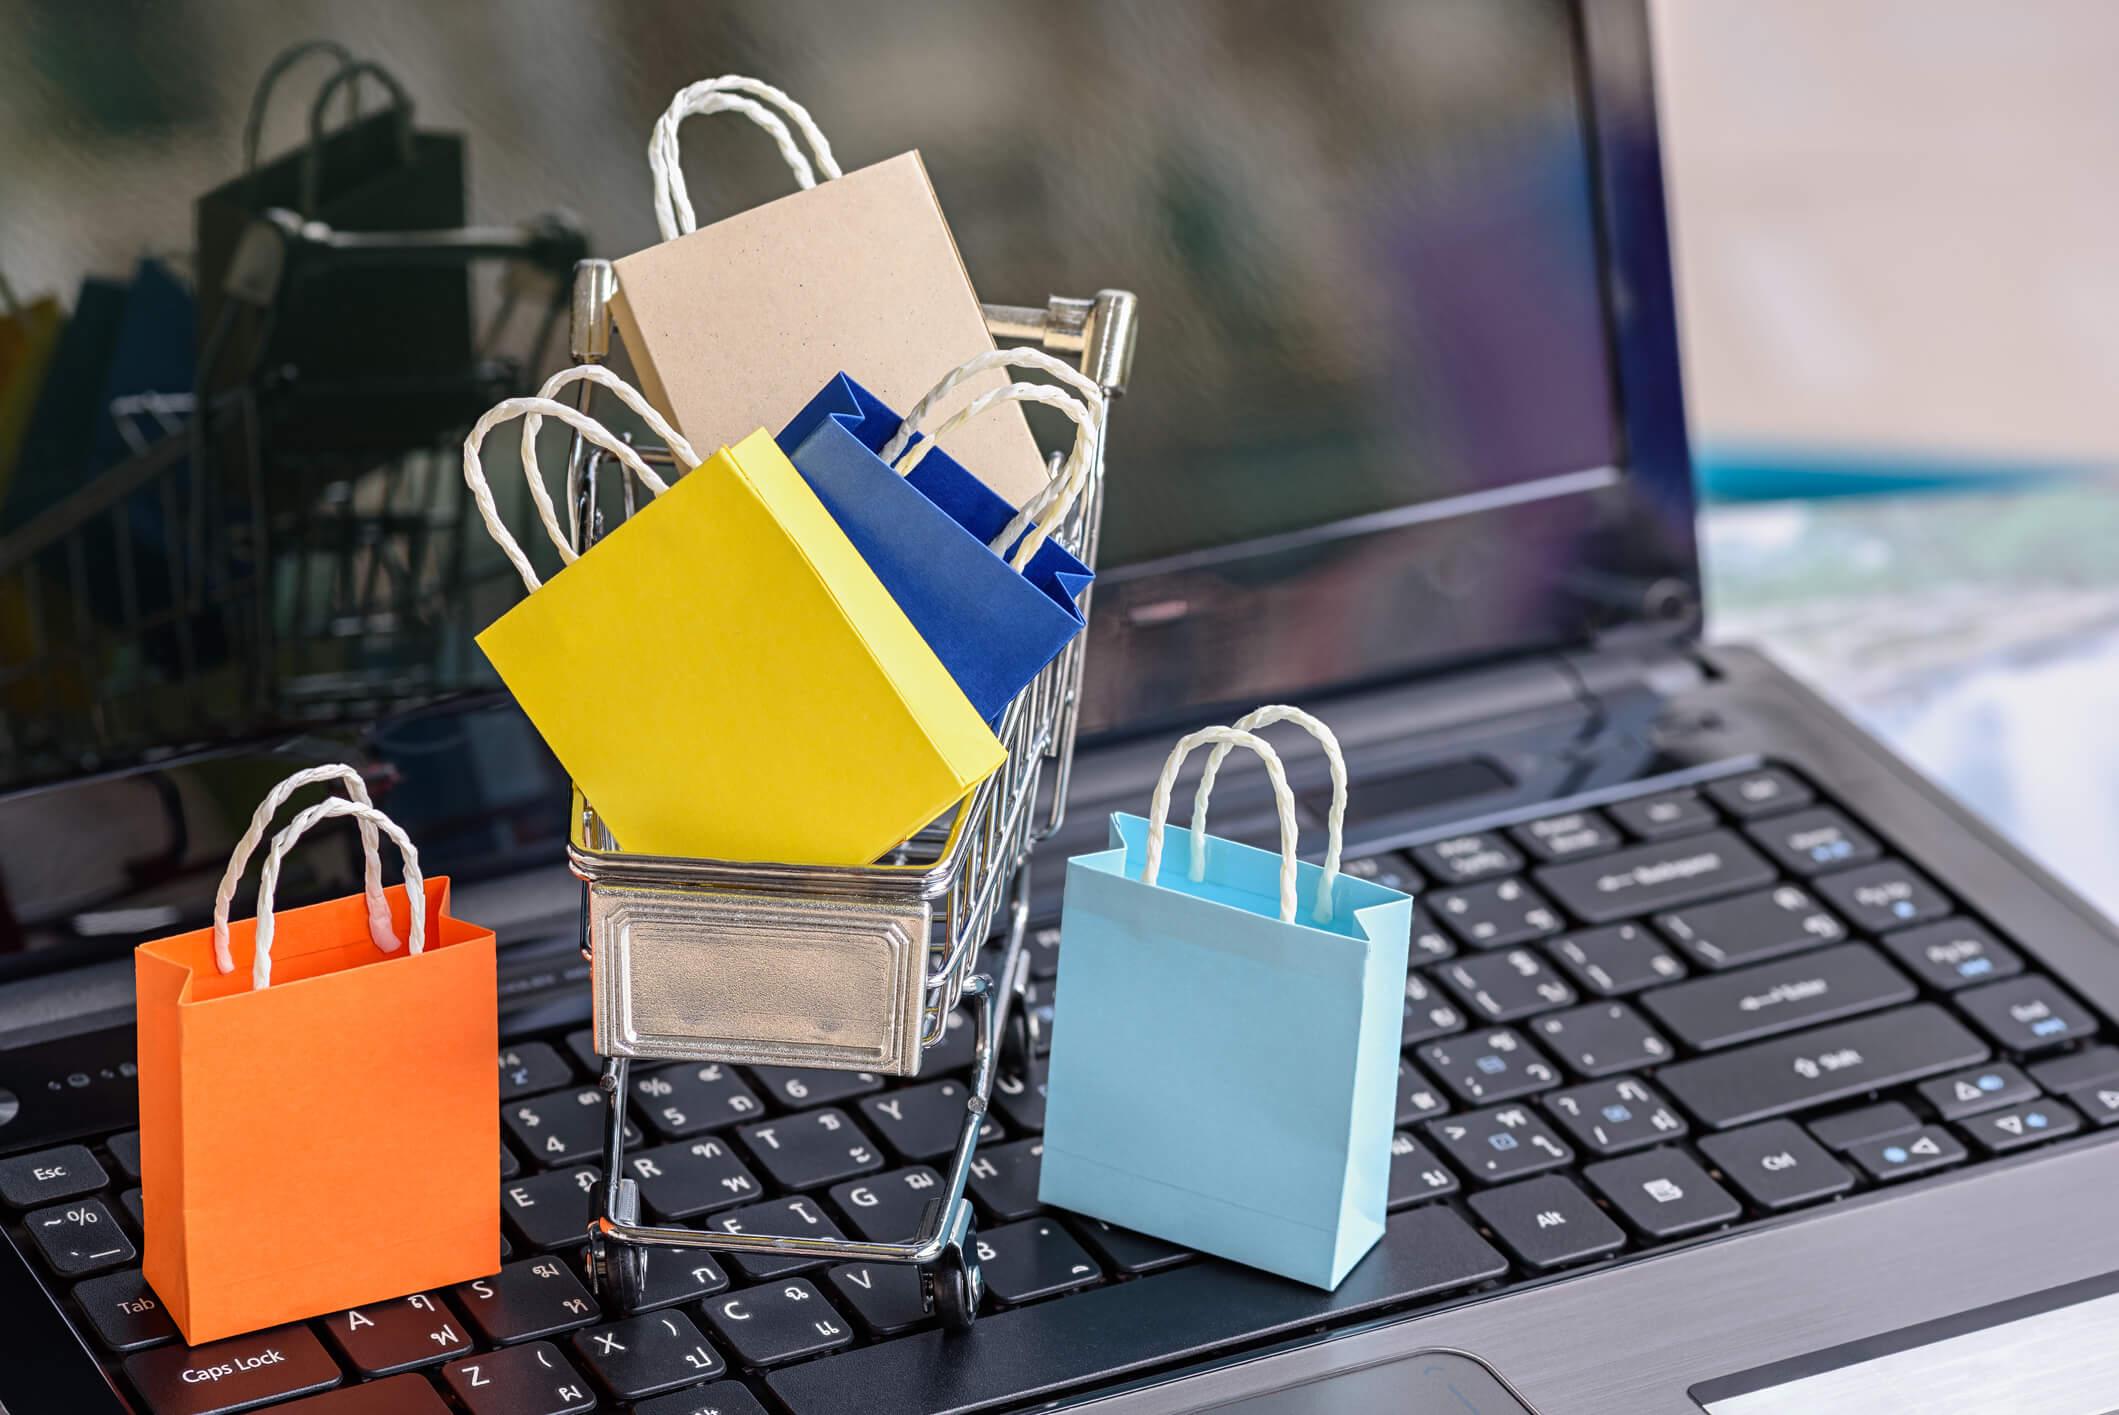 Онлайн-покупки: правила безопасности